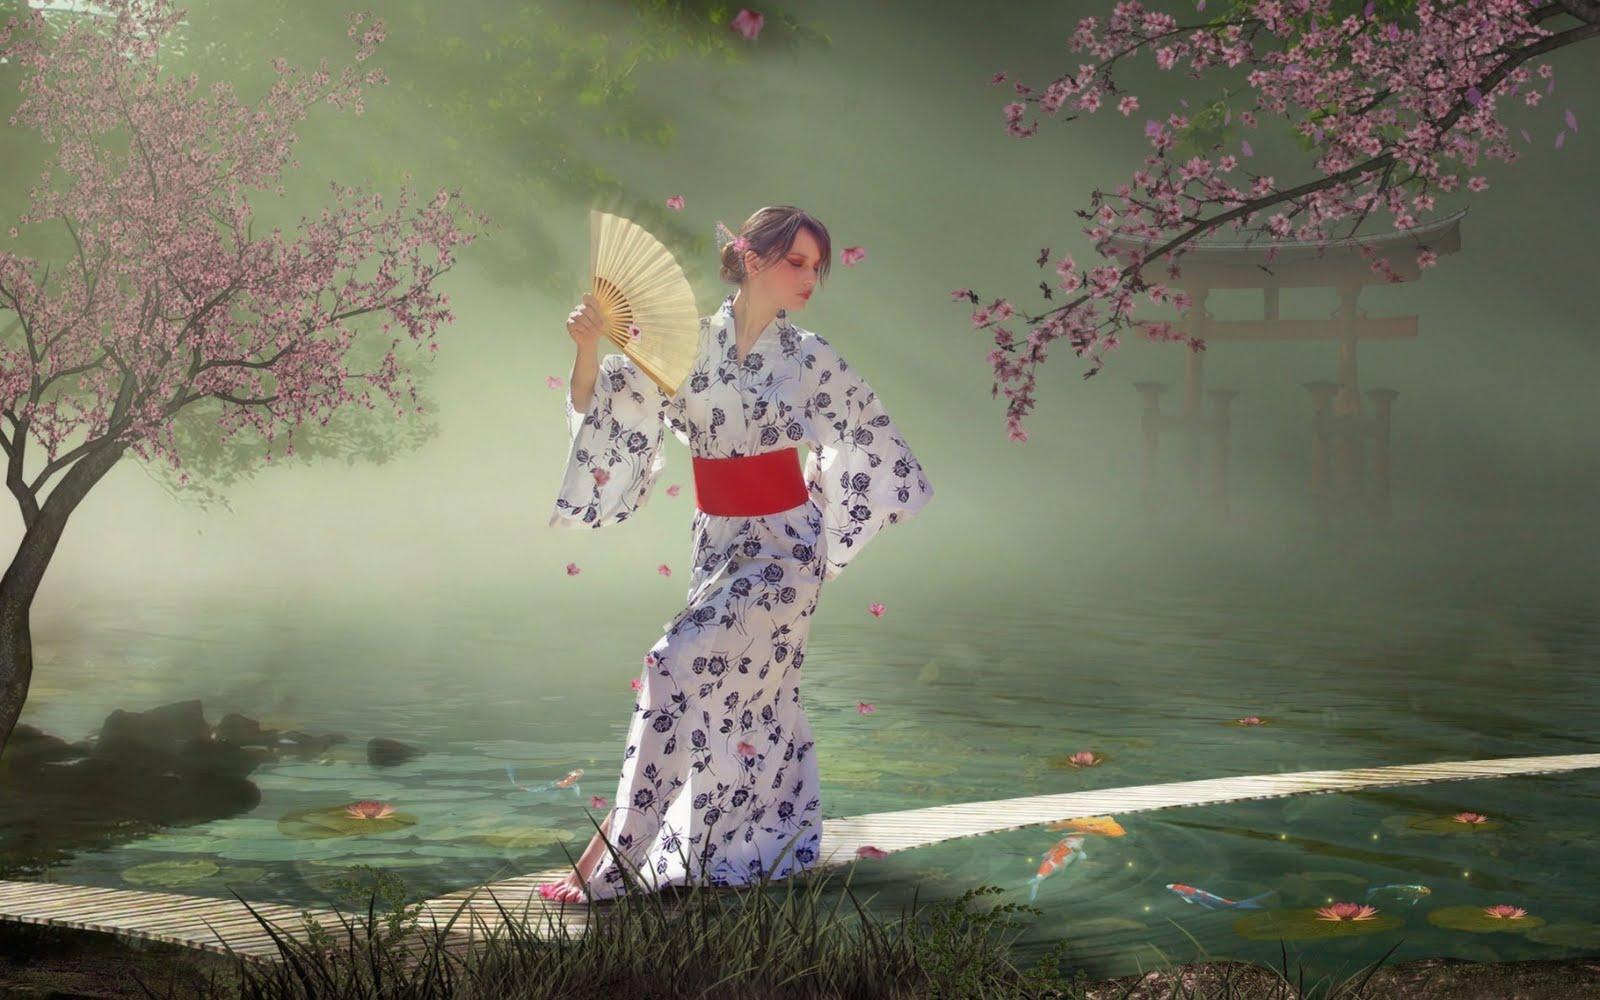 Japanese wallpapers: Various Japanese wallpapers